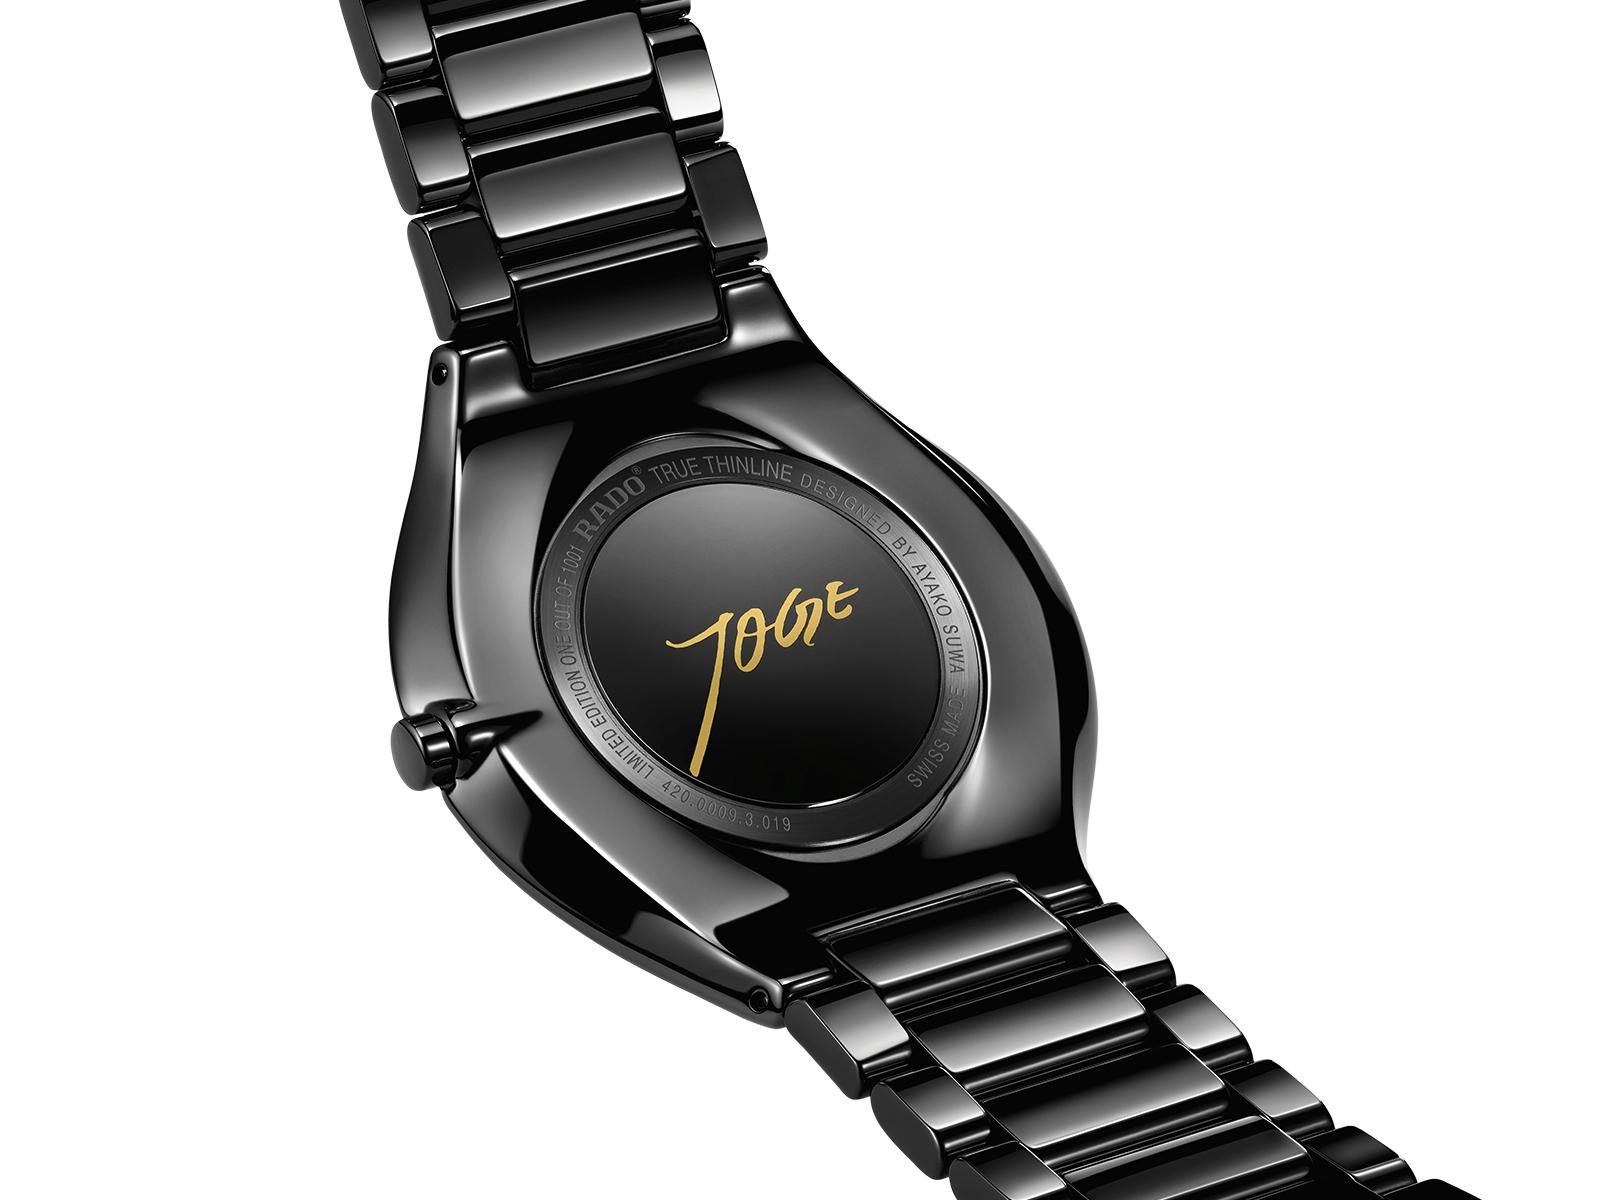 【RADO ラドー】True Thinline TOGE シンライン トゲ 1001本限定/国内正規品 腕時計